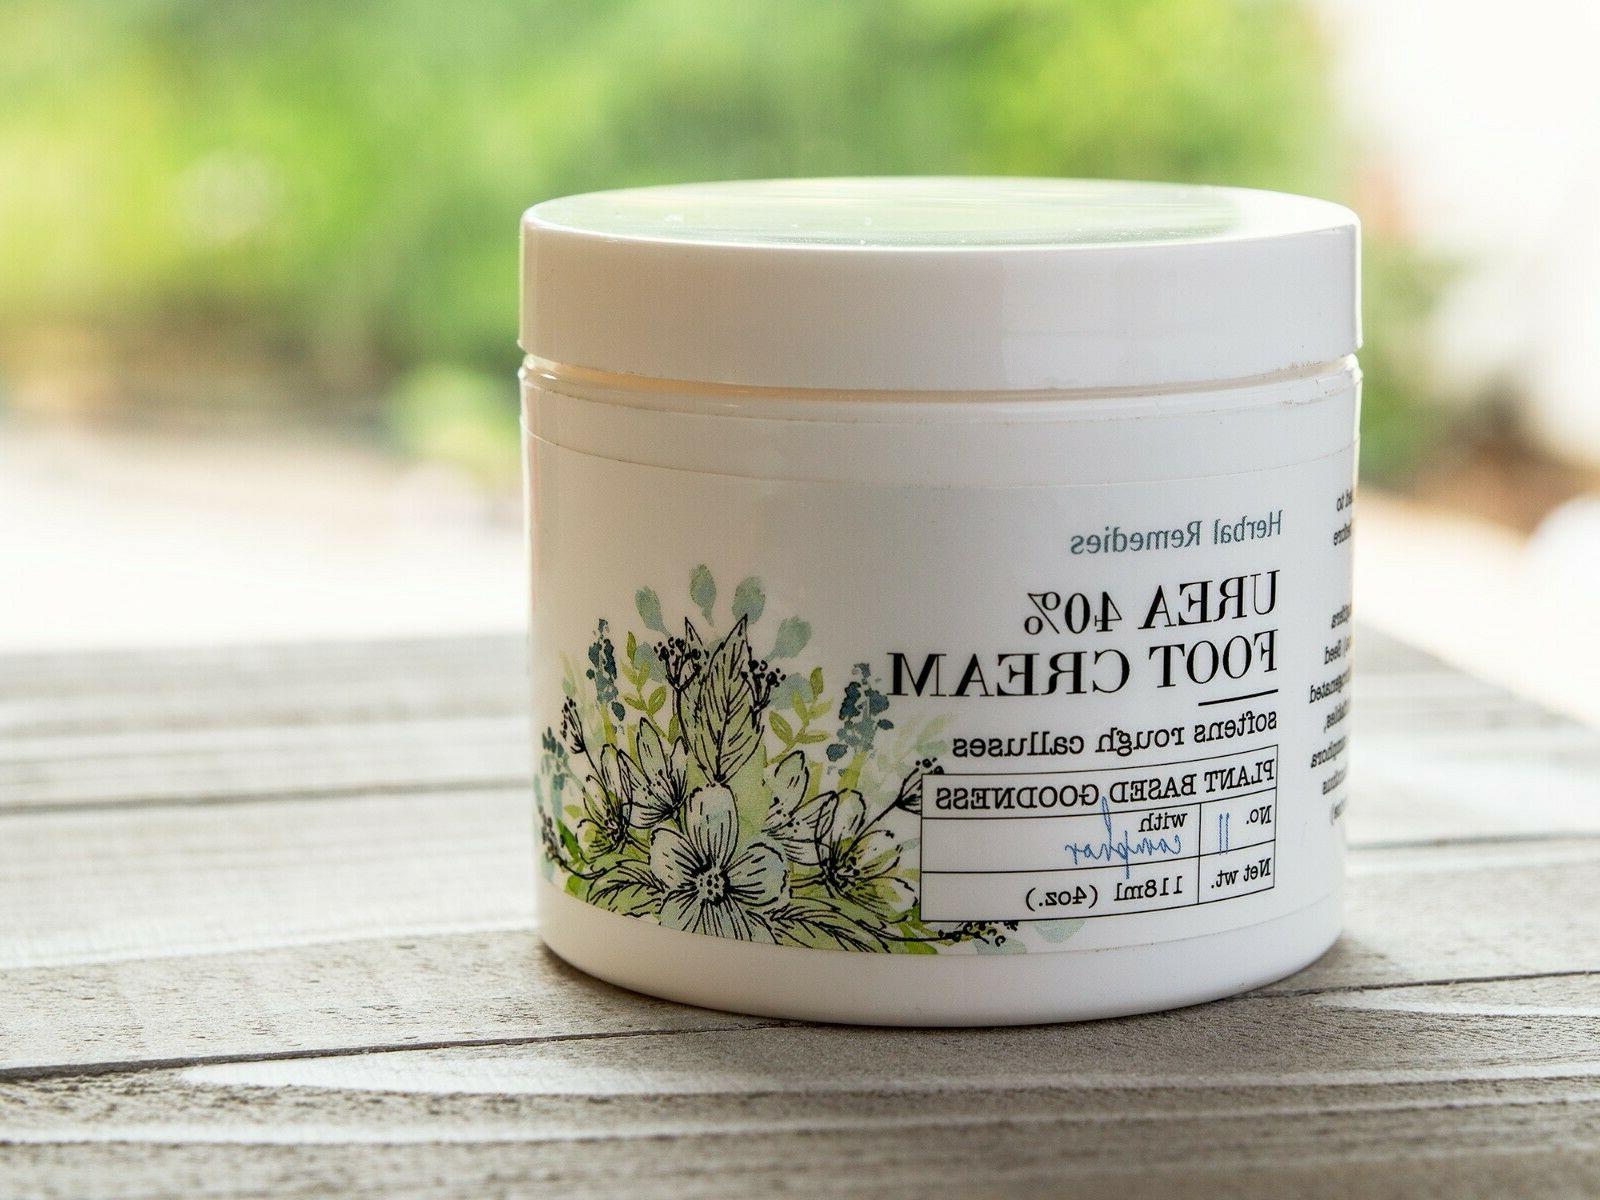 Herbal Remedies Urea Foot Cream Moisturizer for